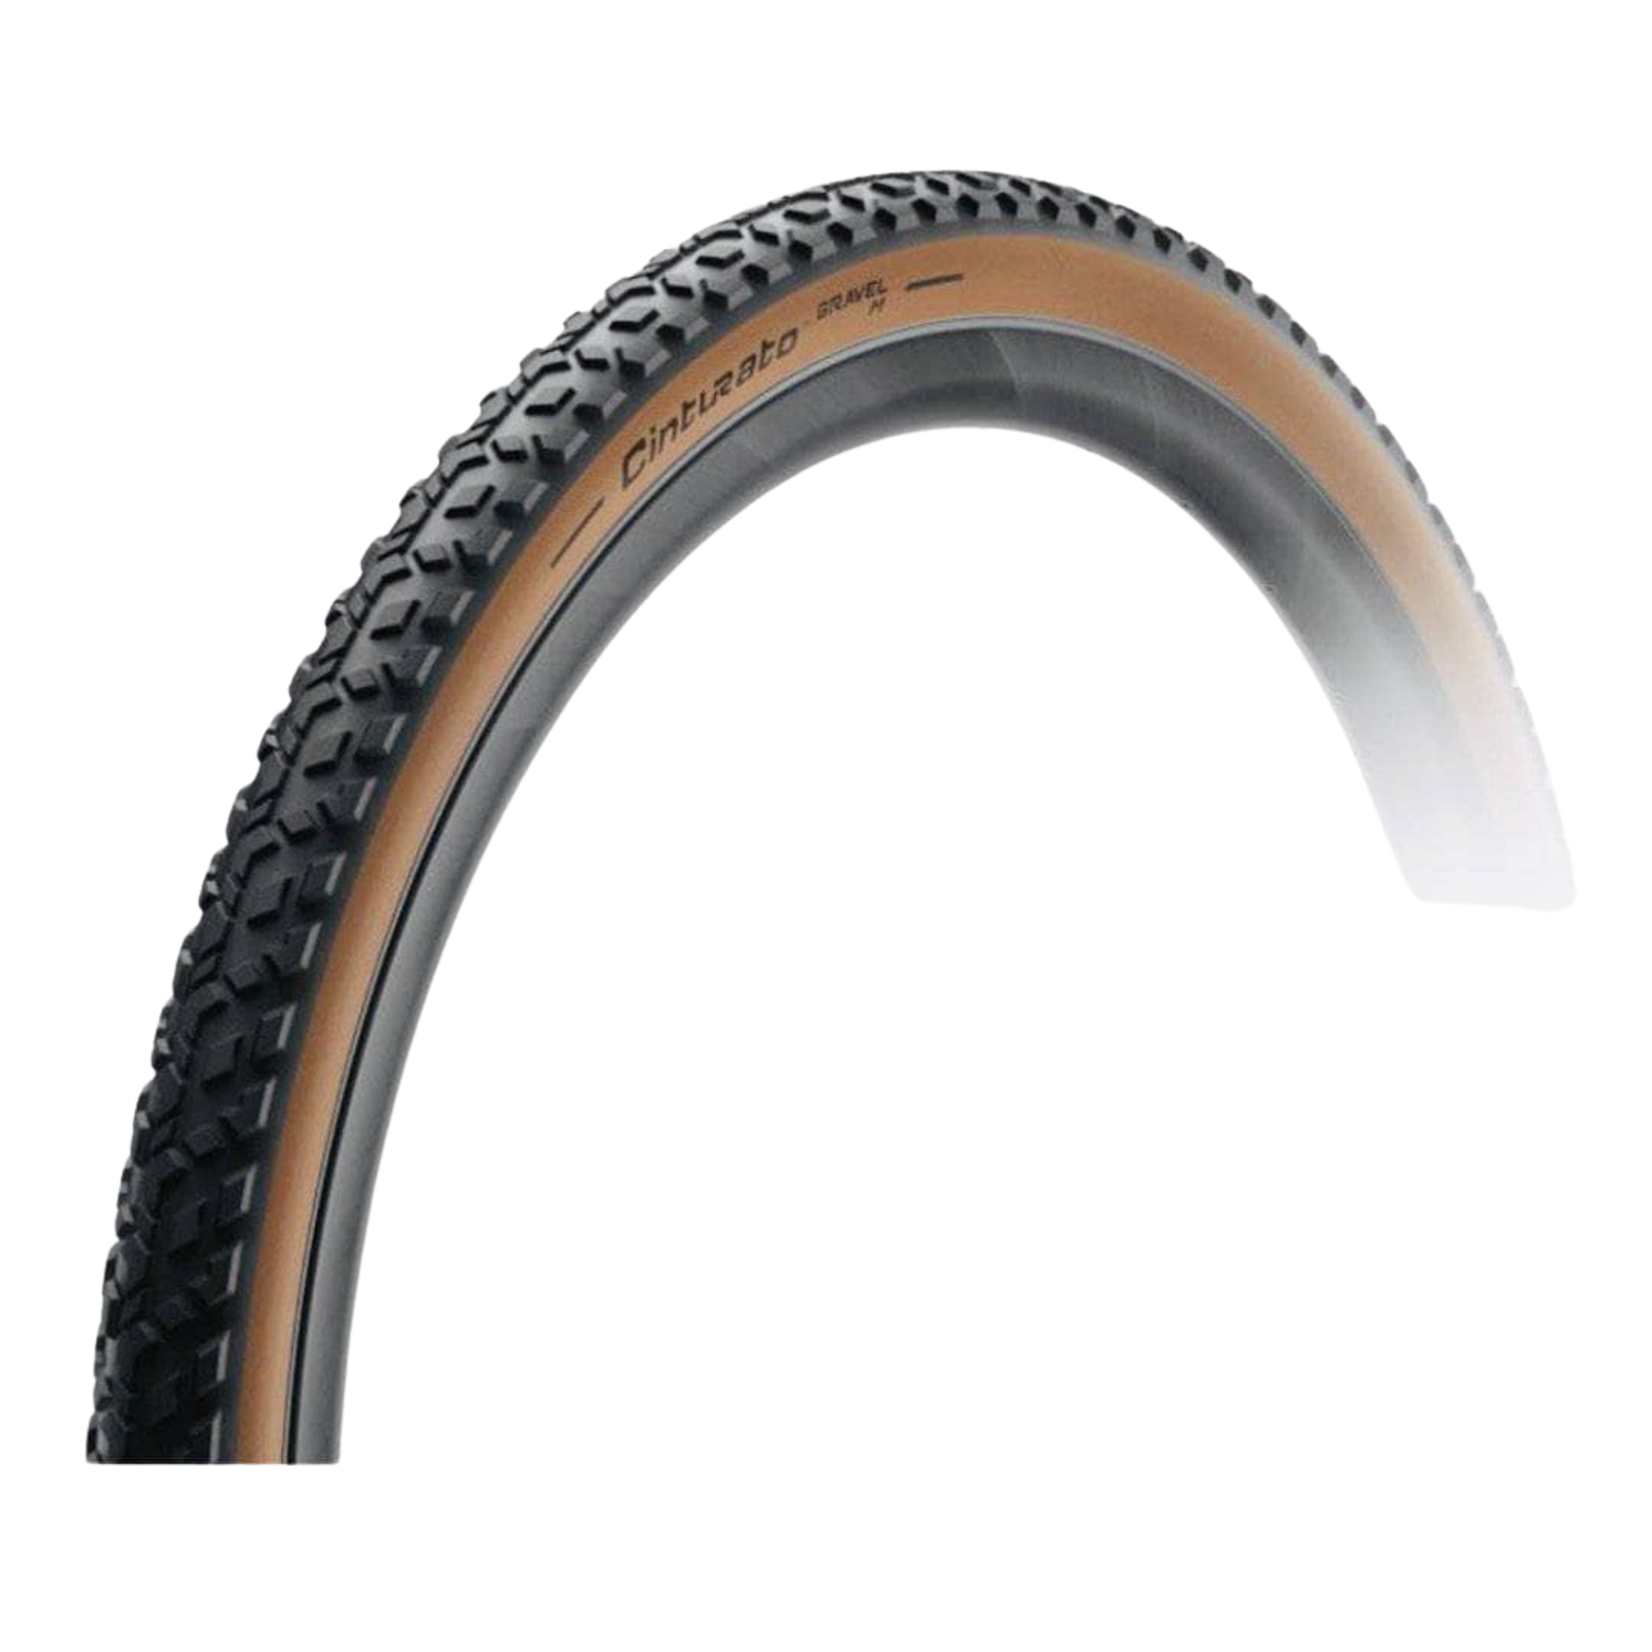 Pirelli Pirelli Cinturato Gravel M 700x40c Folding Bead Tubeless Ready Tire Tan Sidewall